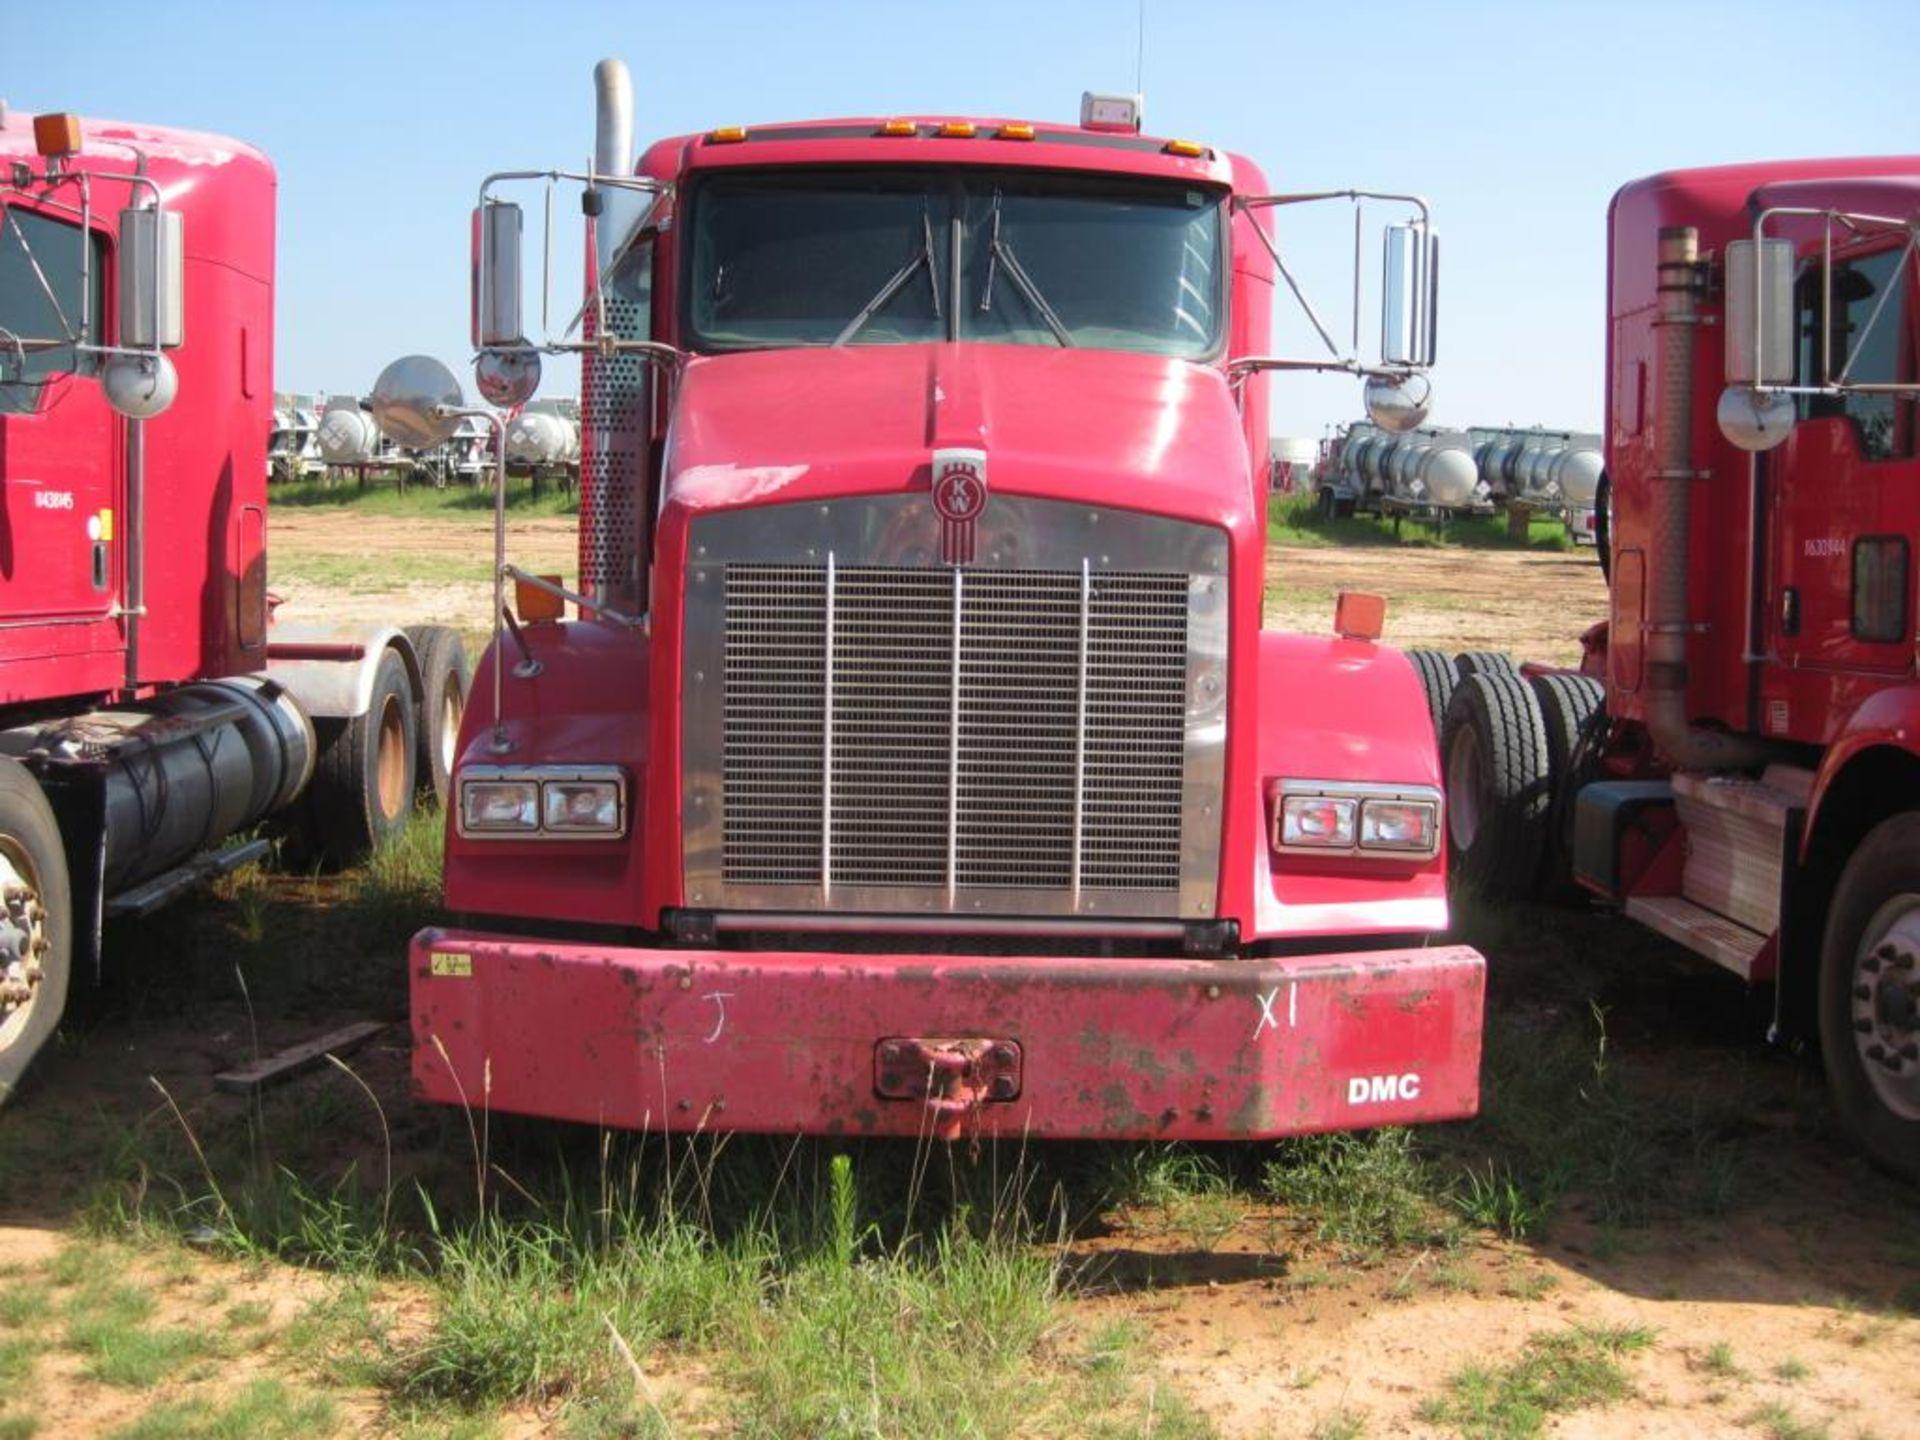 Kenworth Truck - Image 3 of 21